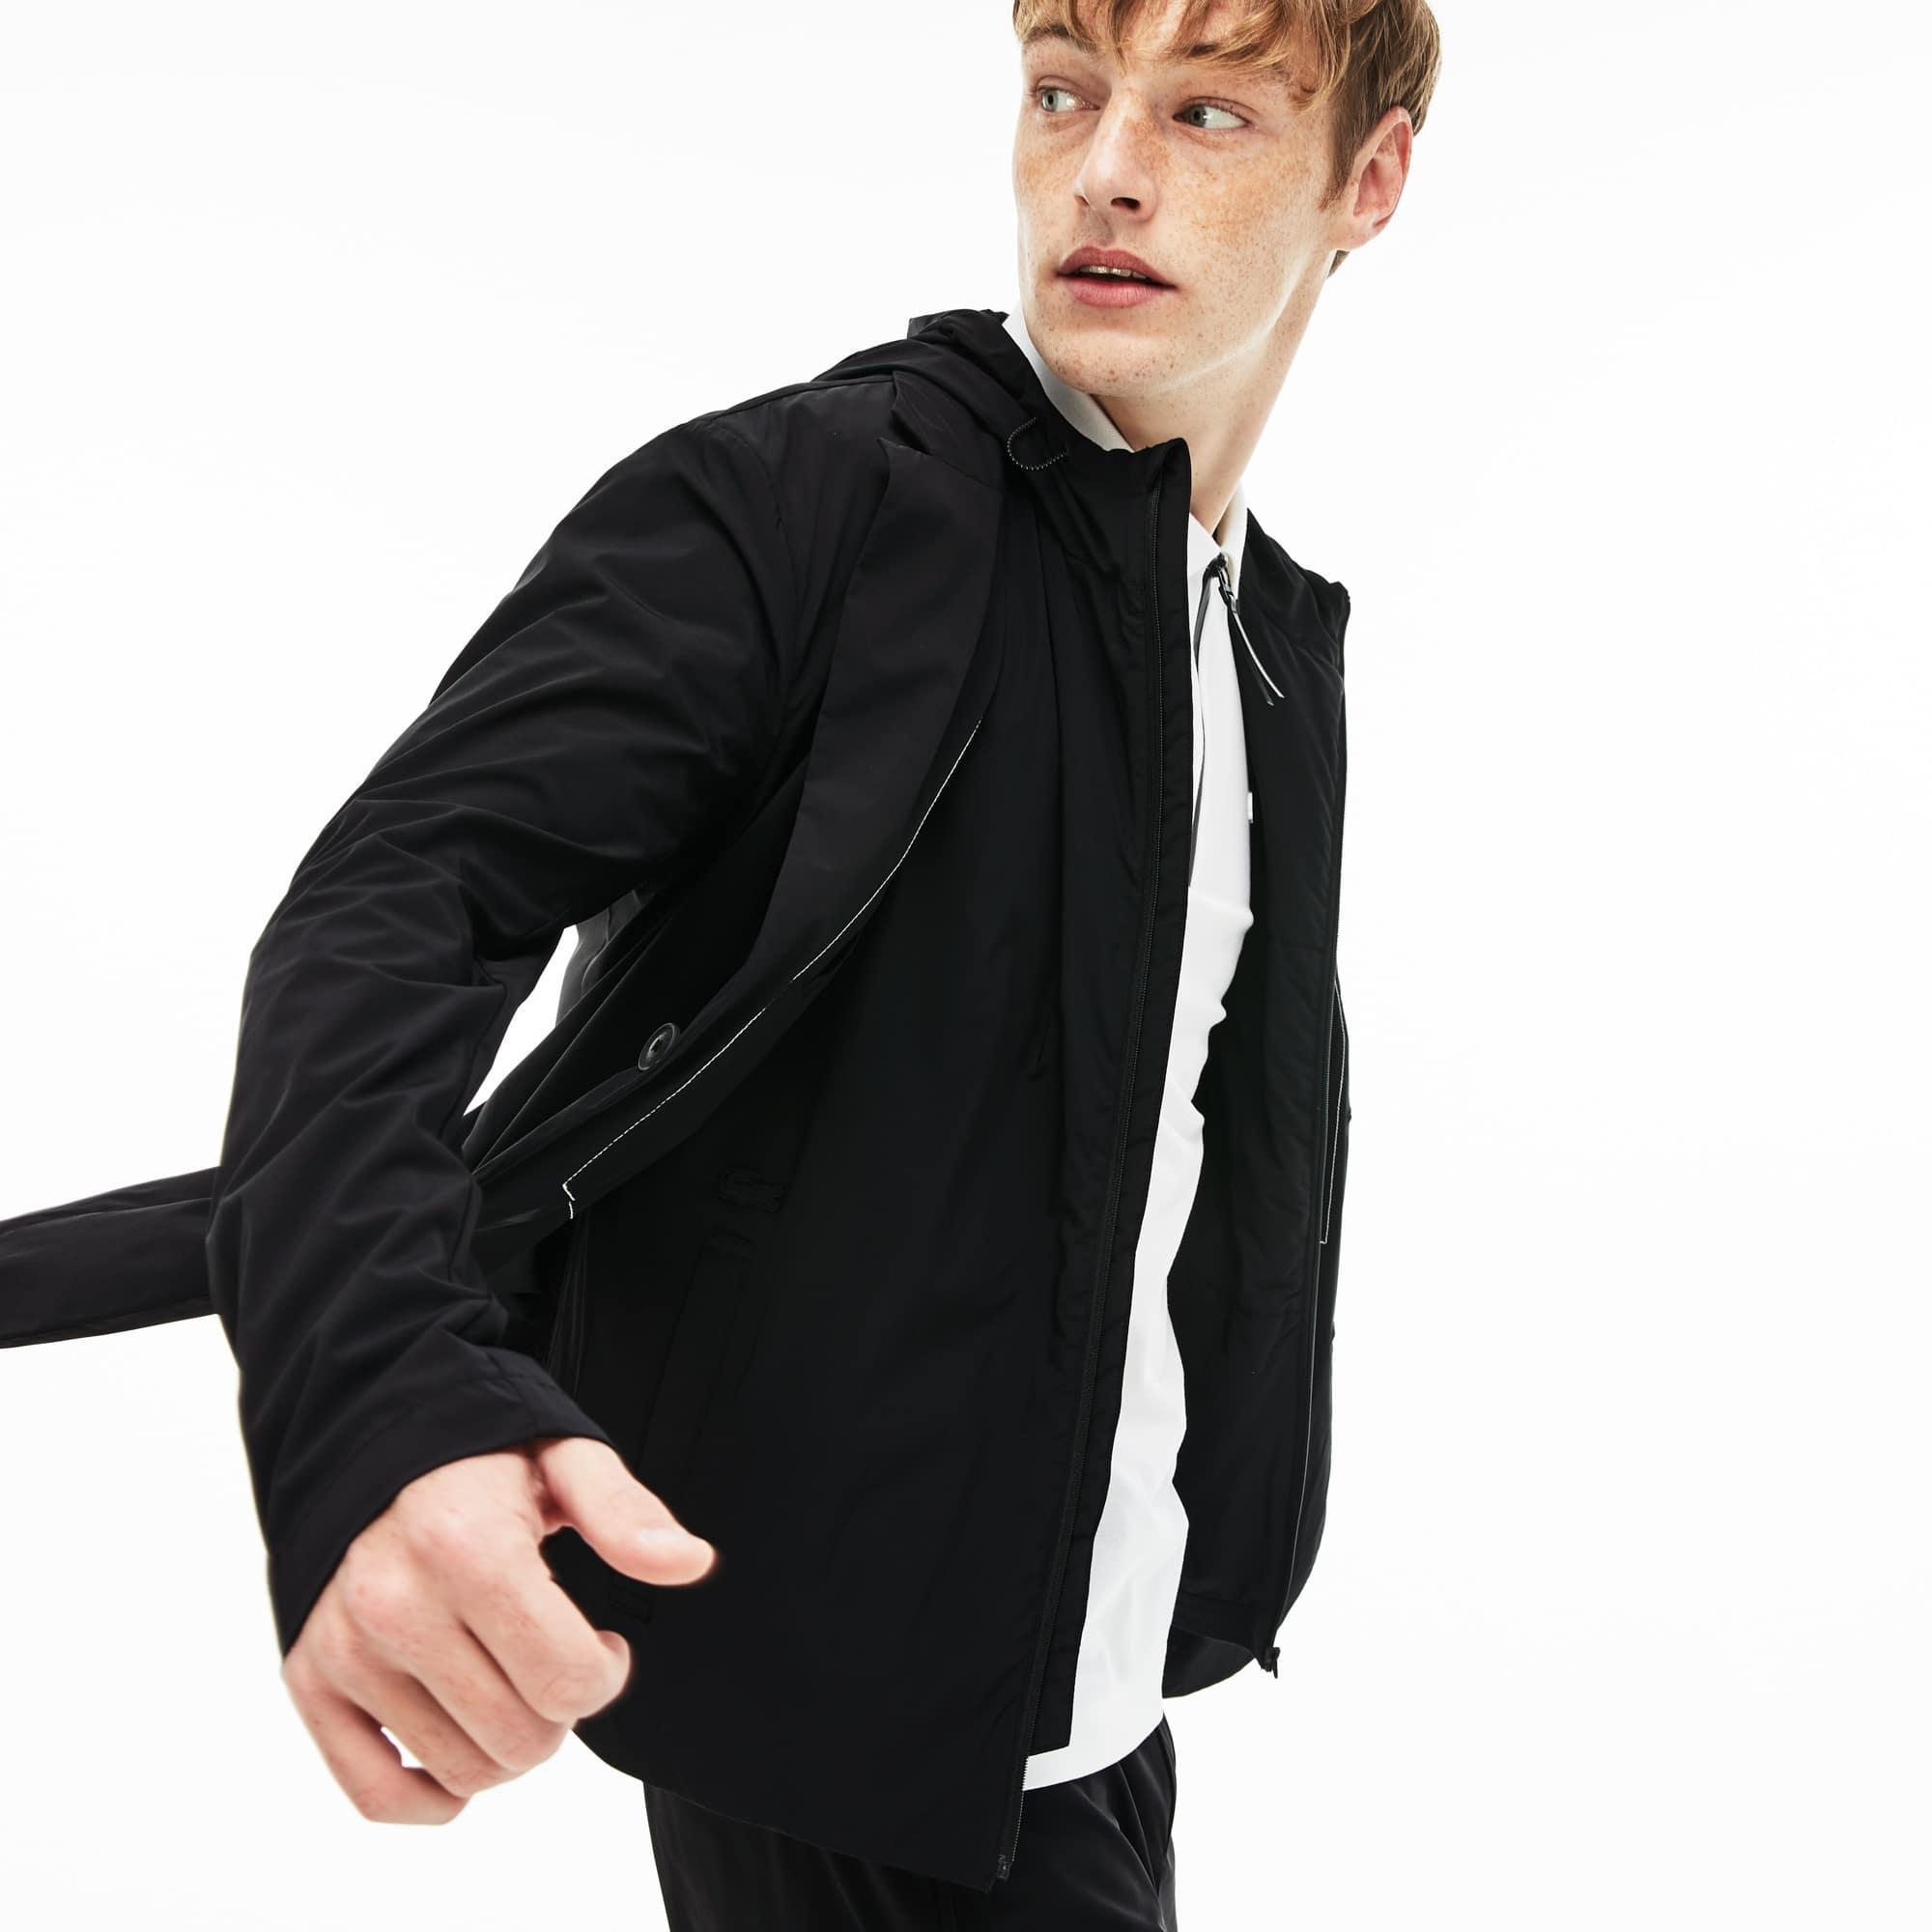 Men's Lacoste Motion Hooded 3 in 1 Water-Resistant Blazer